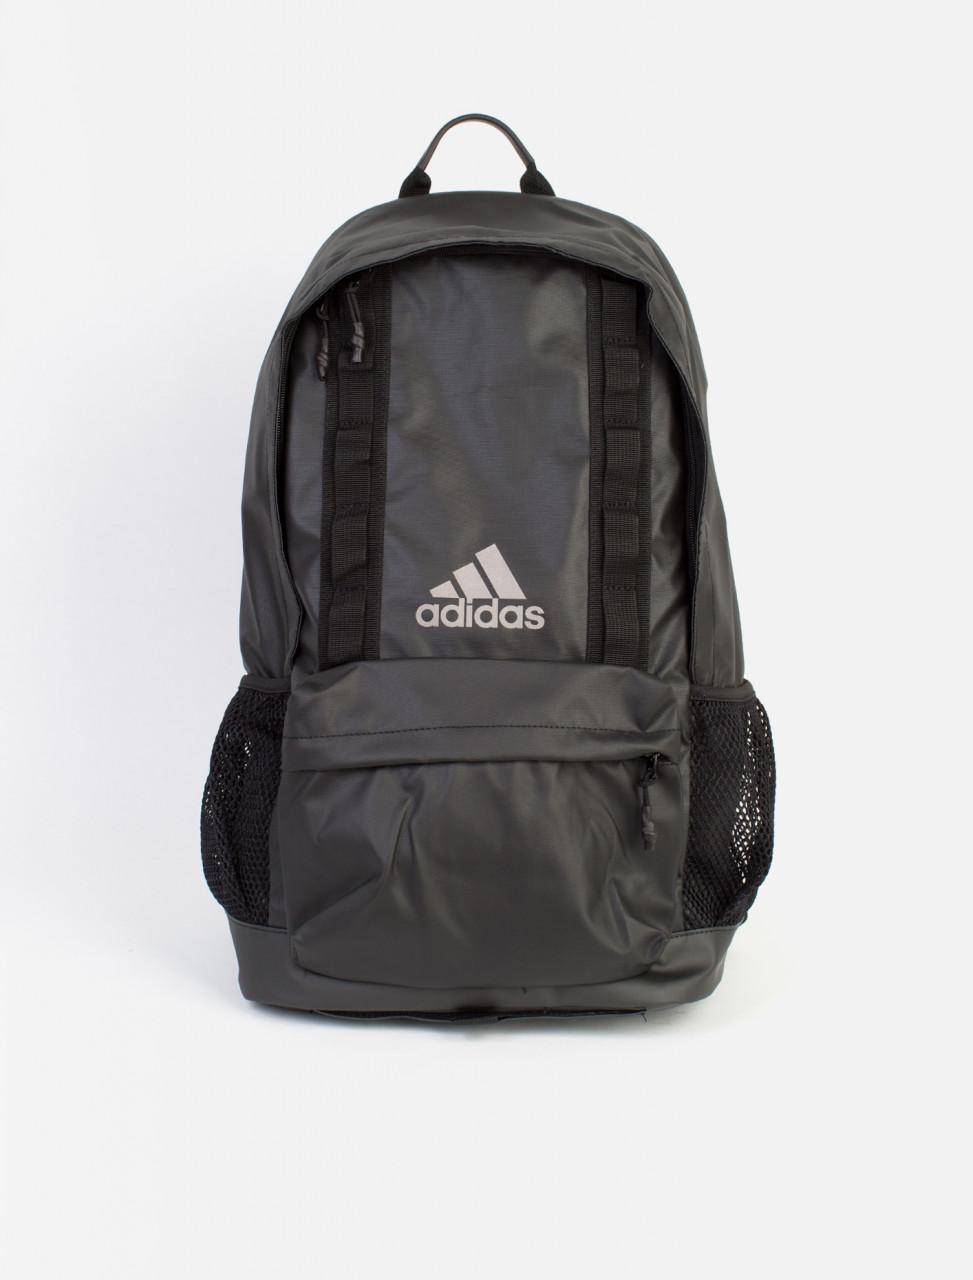 Adidas x Gosha Rubchinskiy Backpack